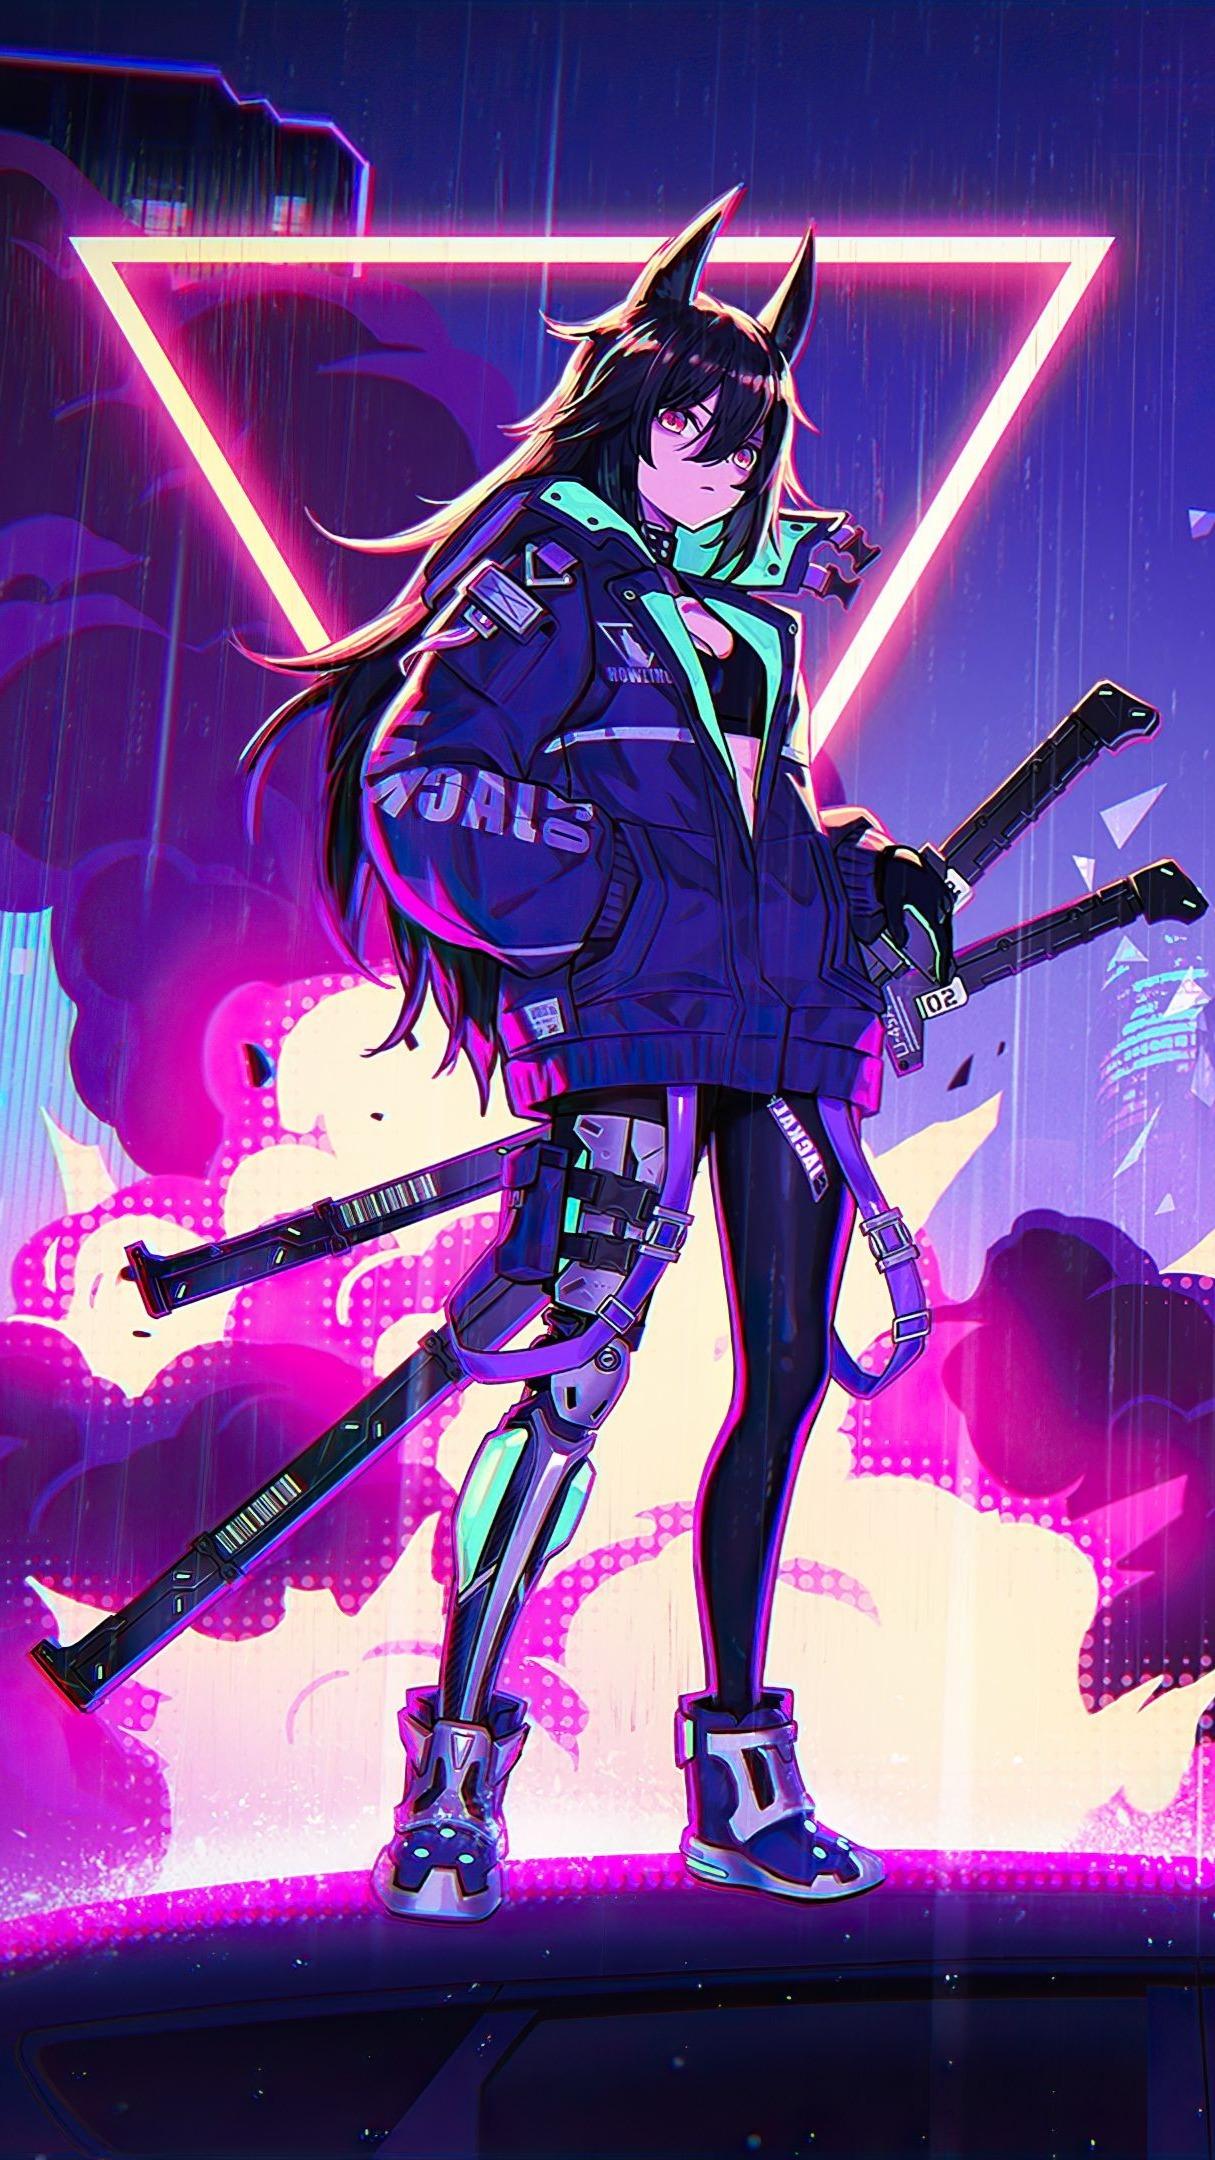 Neon anime girl wallpaper - backiee